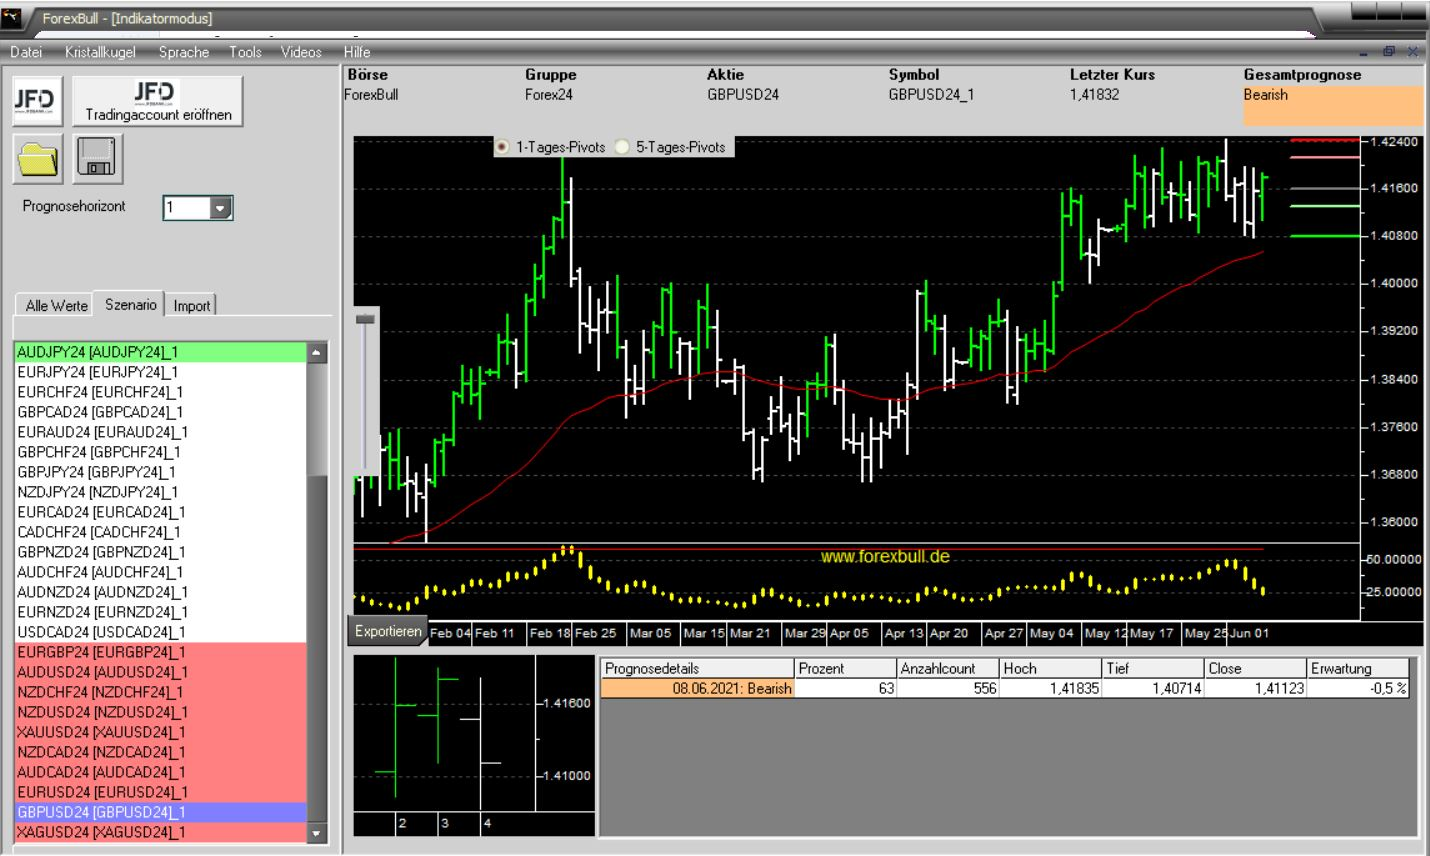 Morning-Briefing-ForexBull-Ein-bunter-Mix-Chartanalyse-JFD-Bank-GodmodeTrader.de-2